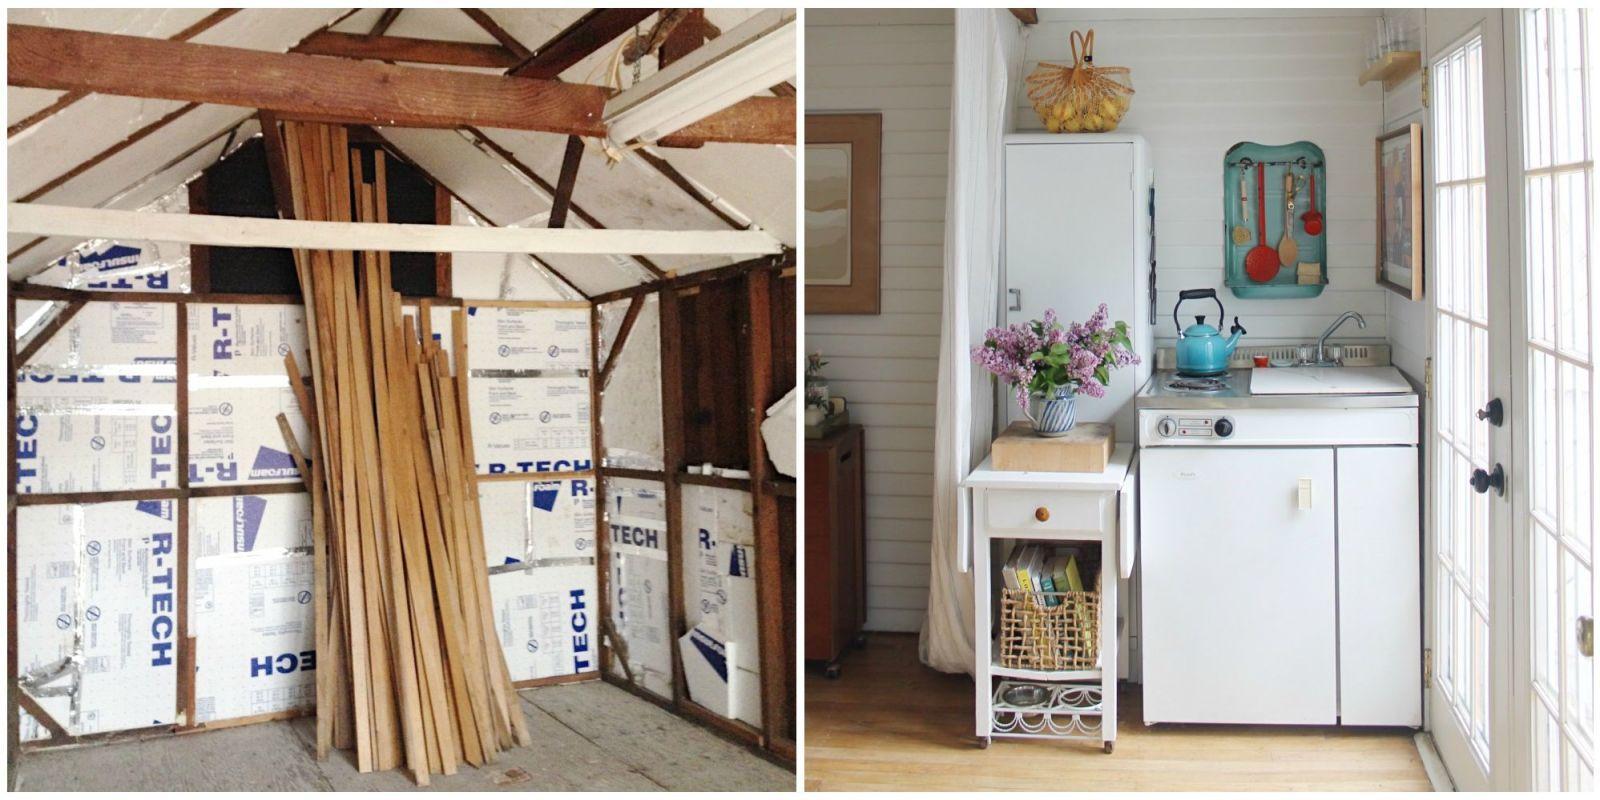 Designing a tiny house Interior Couple Turns Grandmas Garage Into Tiny House Tiny House Talk Small Home Decorating Ideas Tumbleweed Tiny House